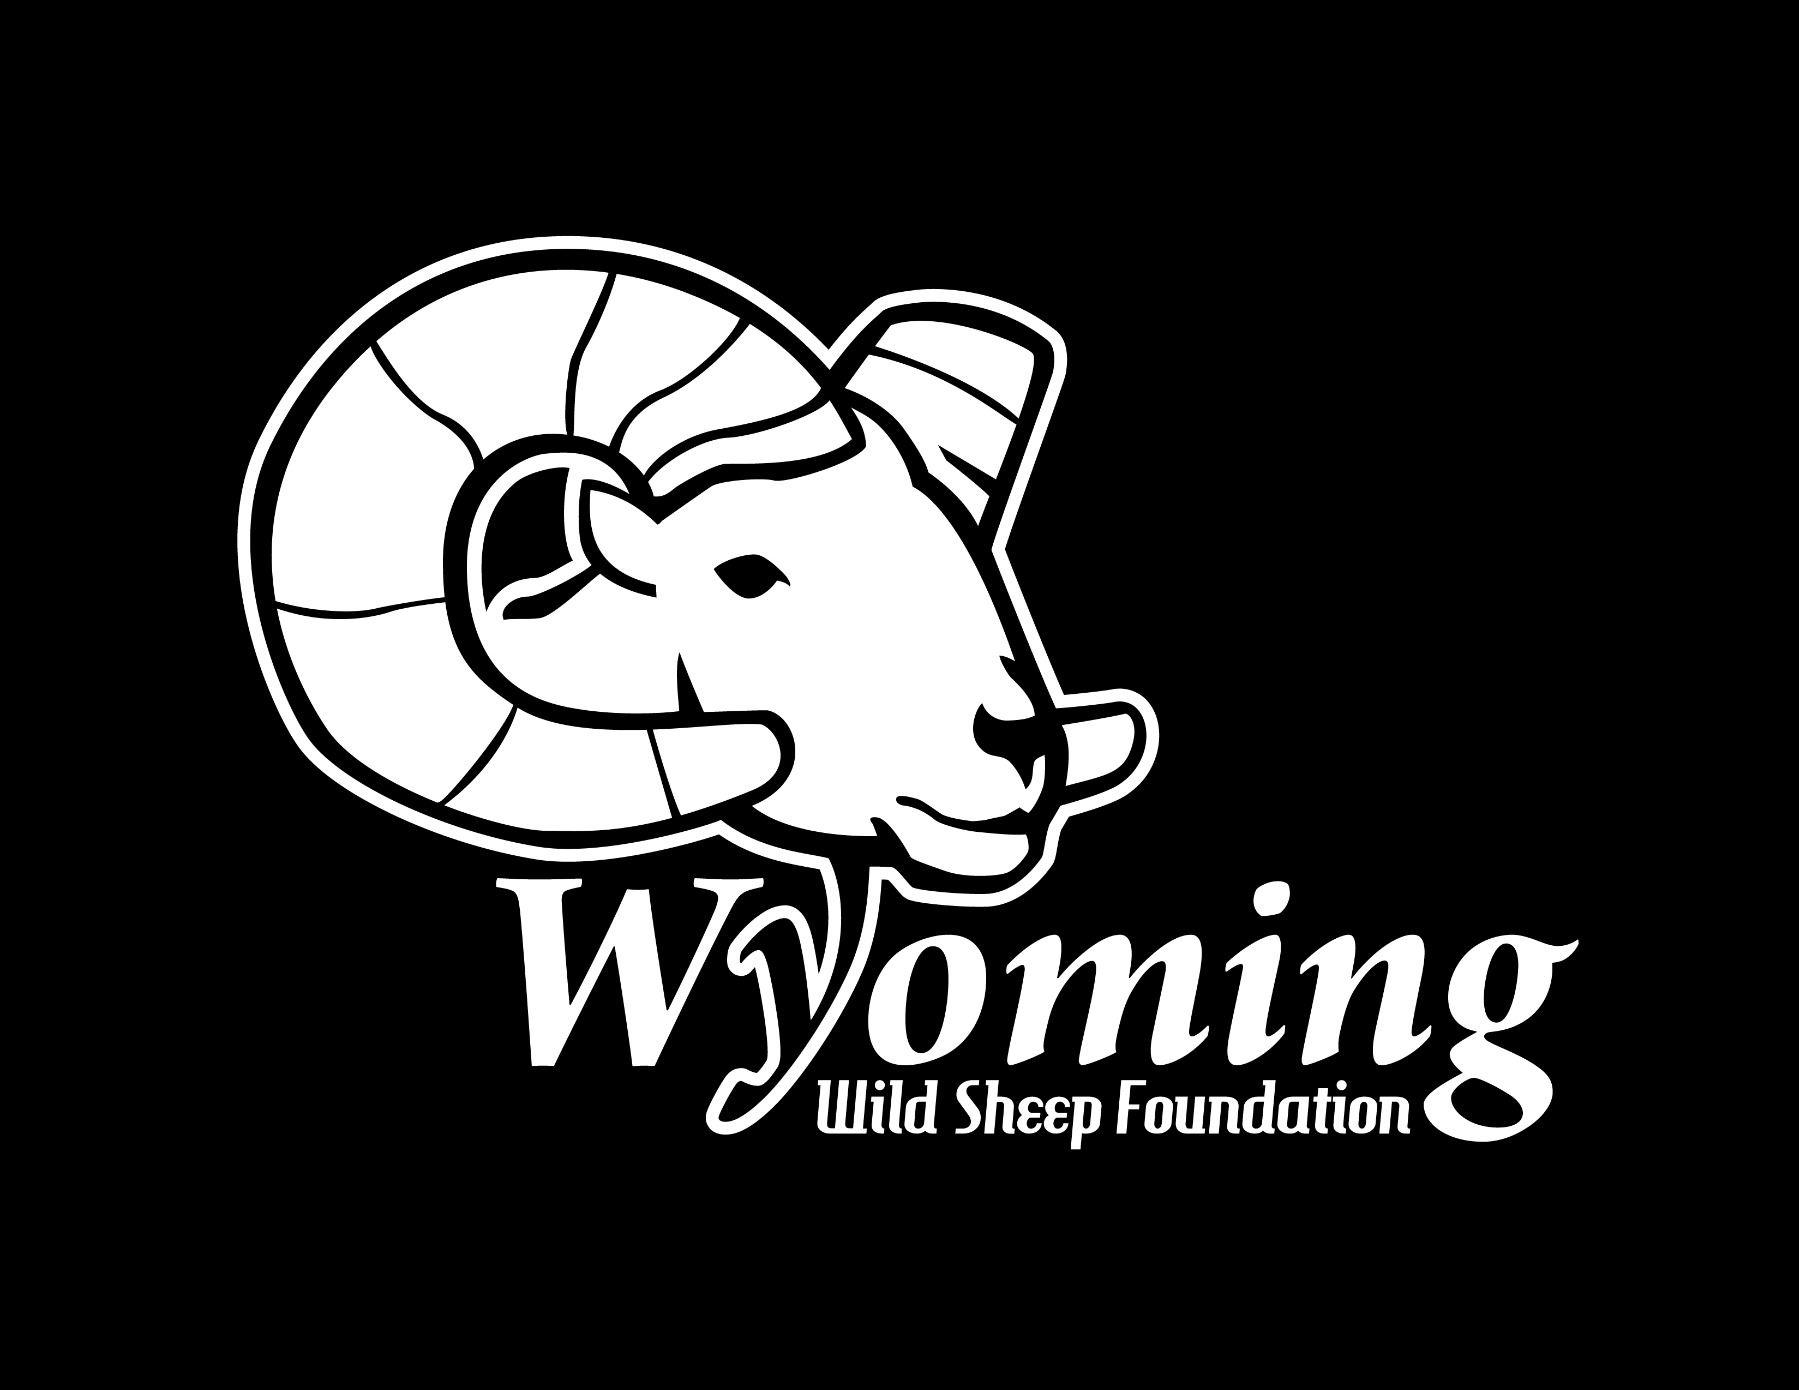 LIFETIME MEMBERSHIP TO WYOMING WSF